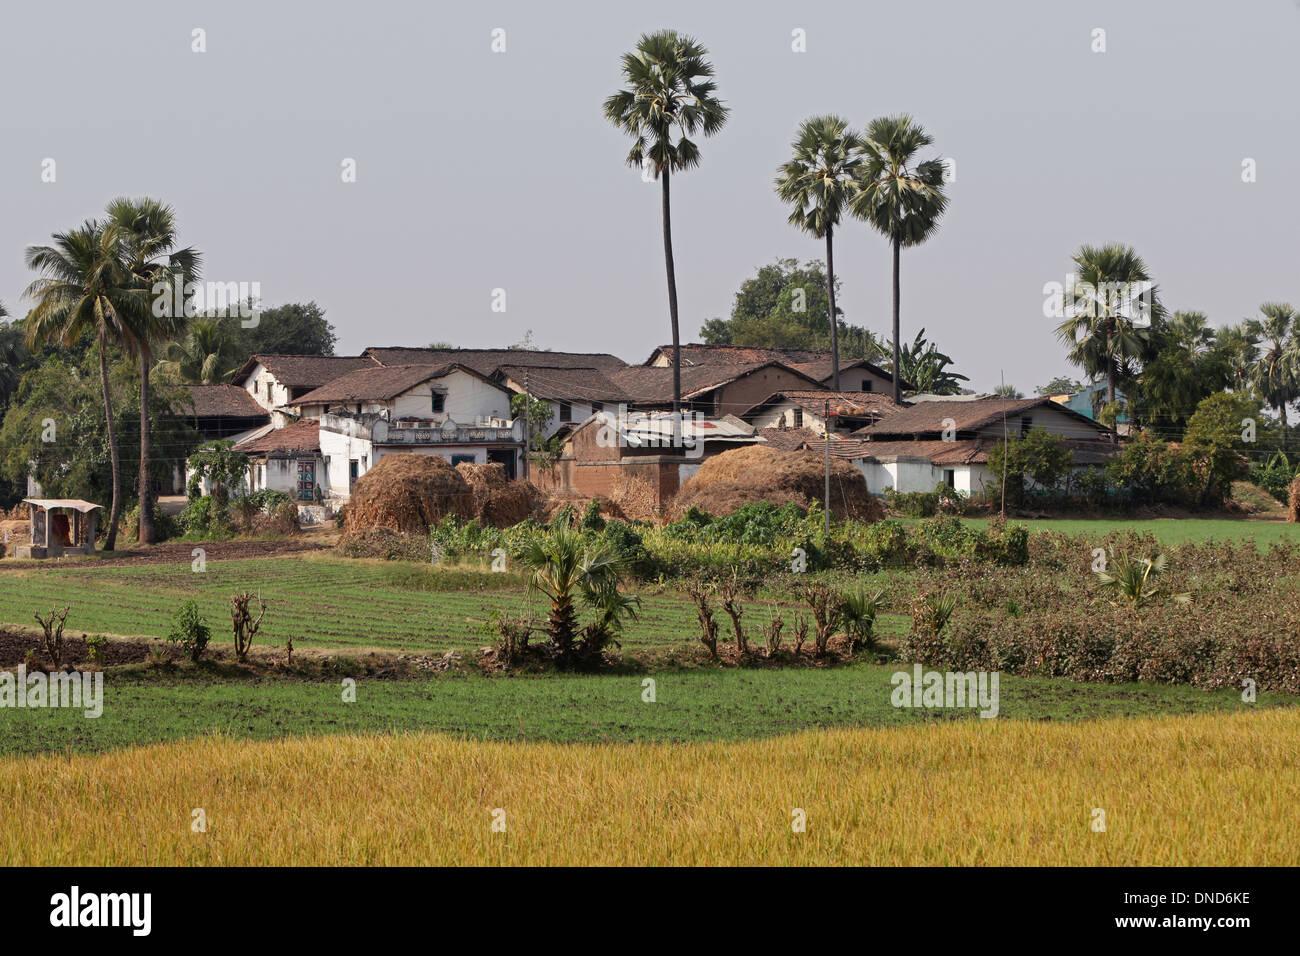 Tribal village settlement. Bhil tribe, Zabua district, Madhya Pradesh, India. - Stock Image